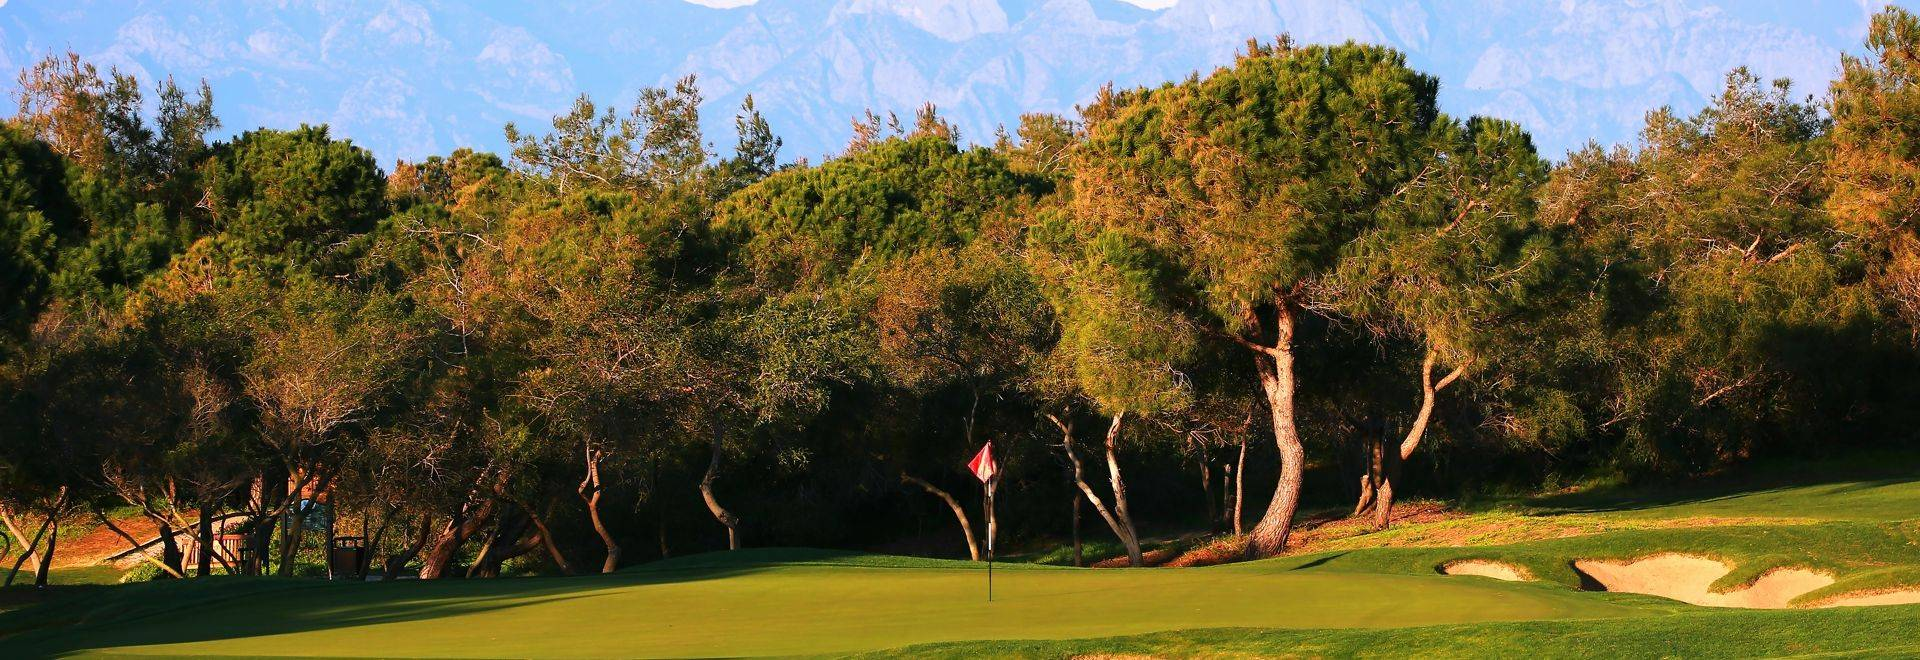 Titanic Golf Club 03